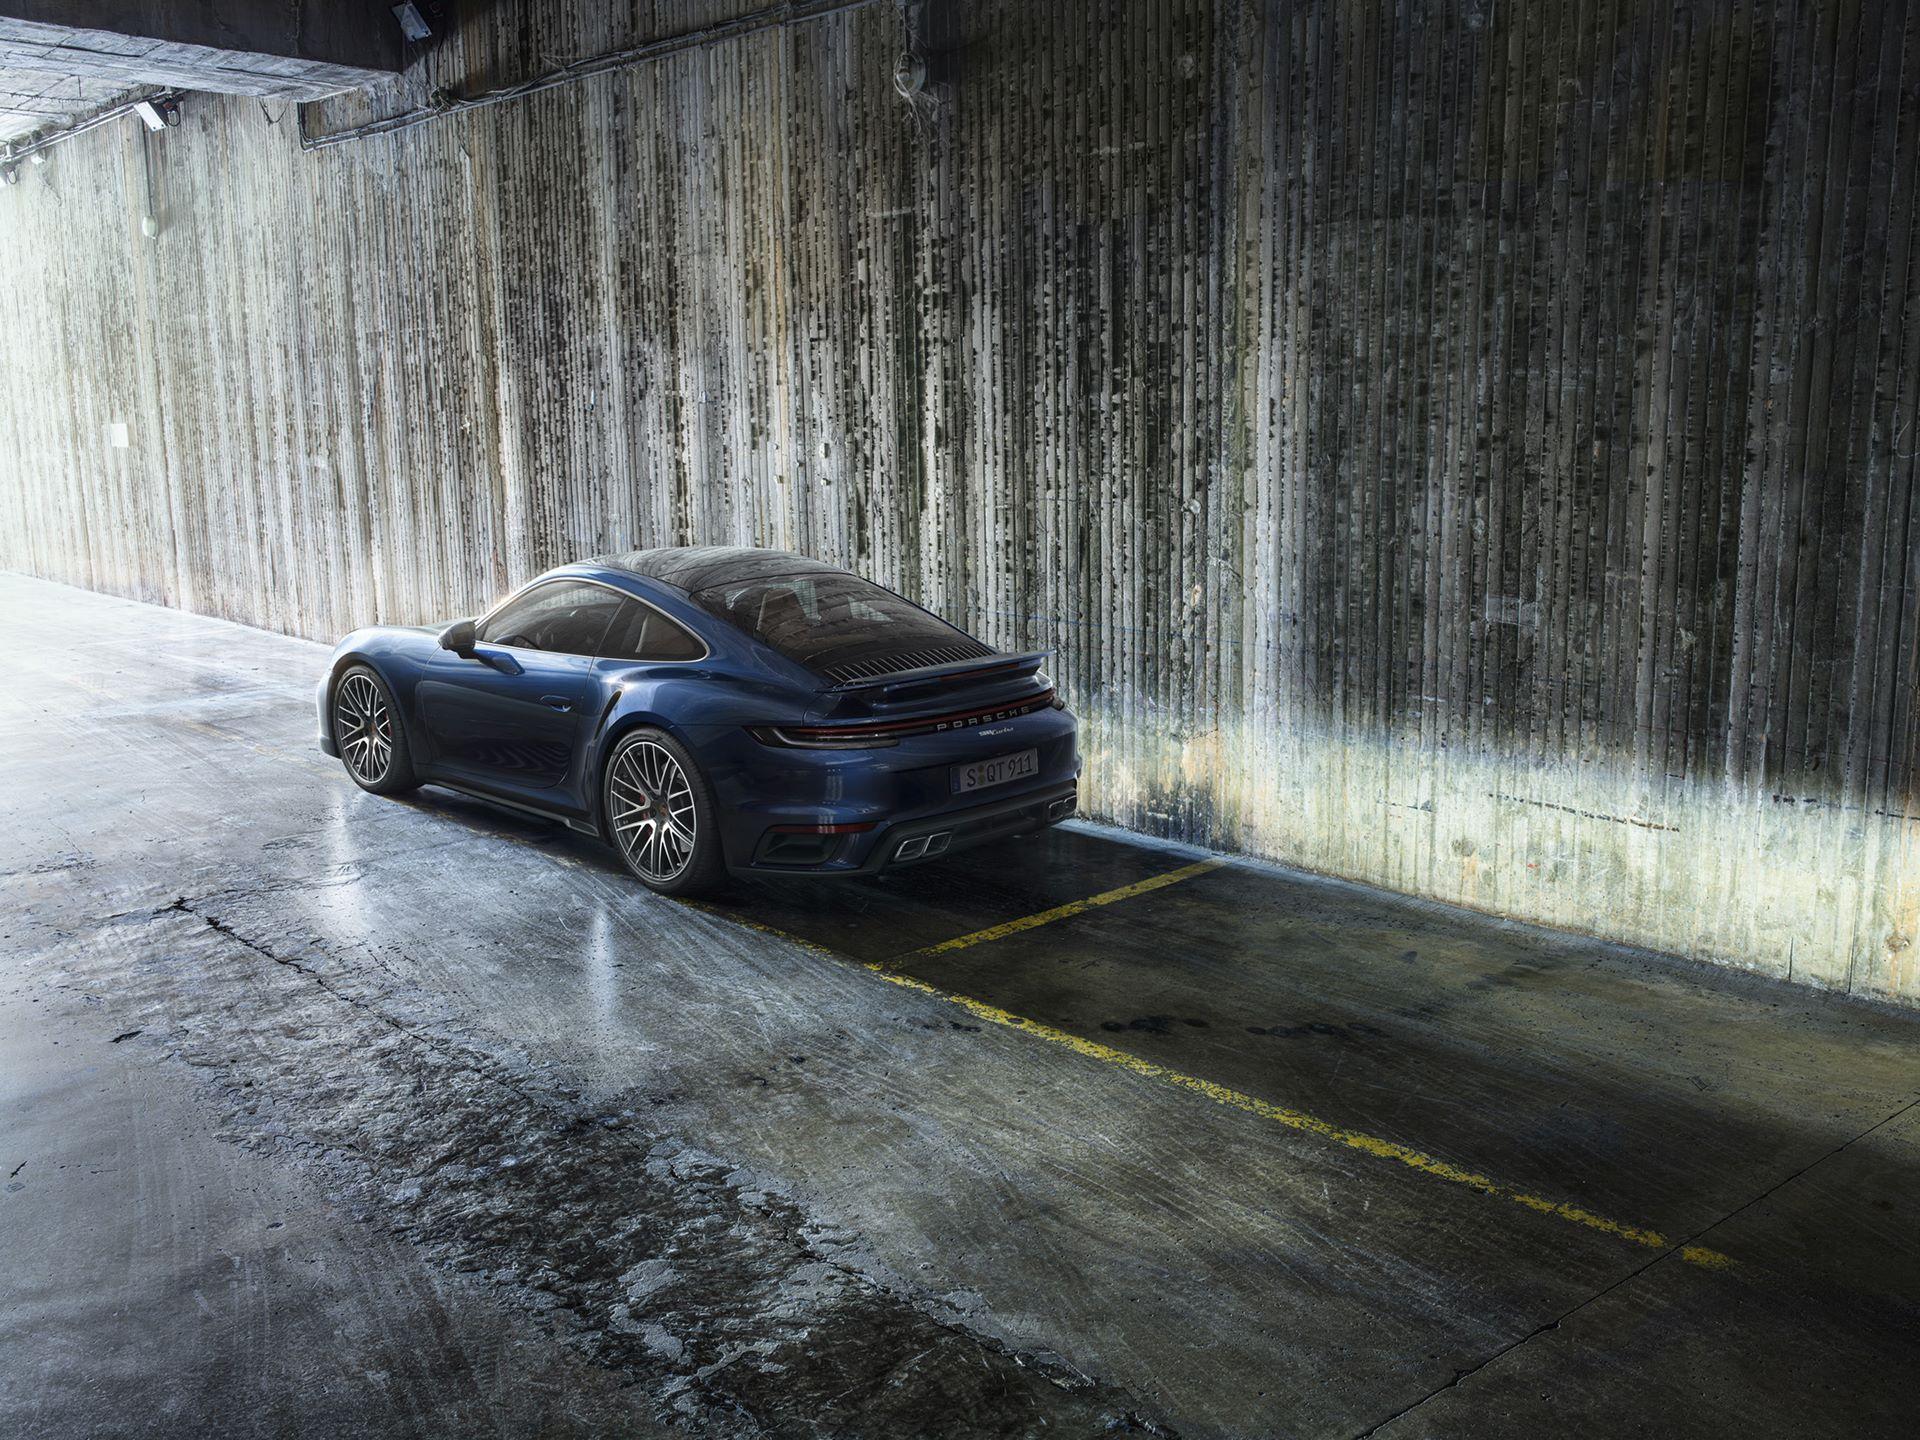 Porsche-911-Turbo-2020-2